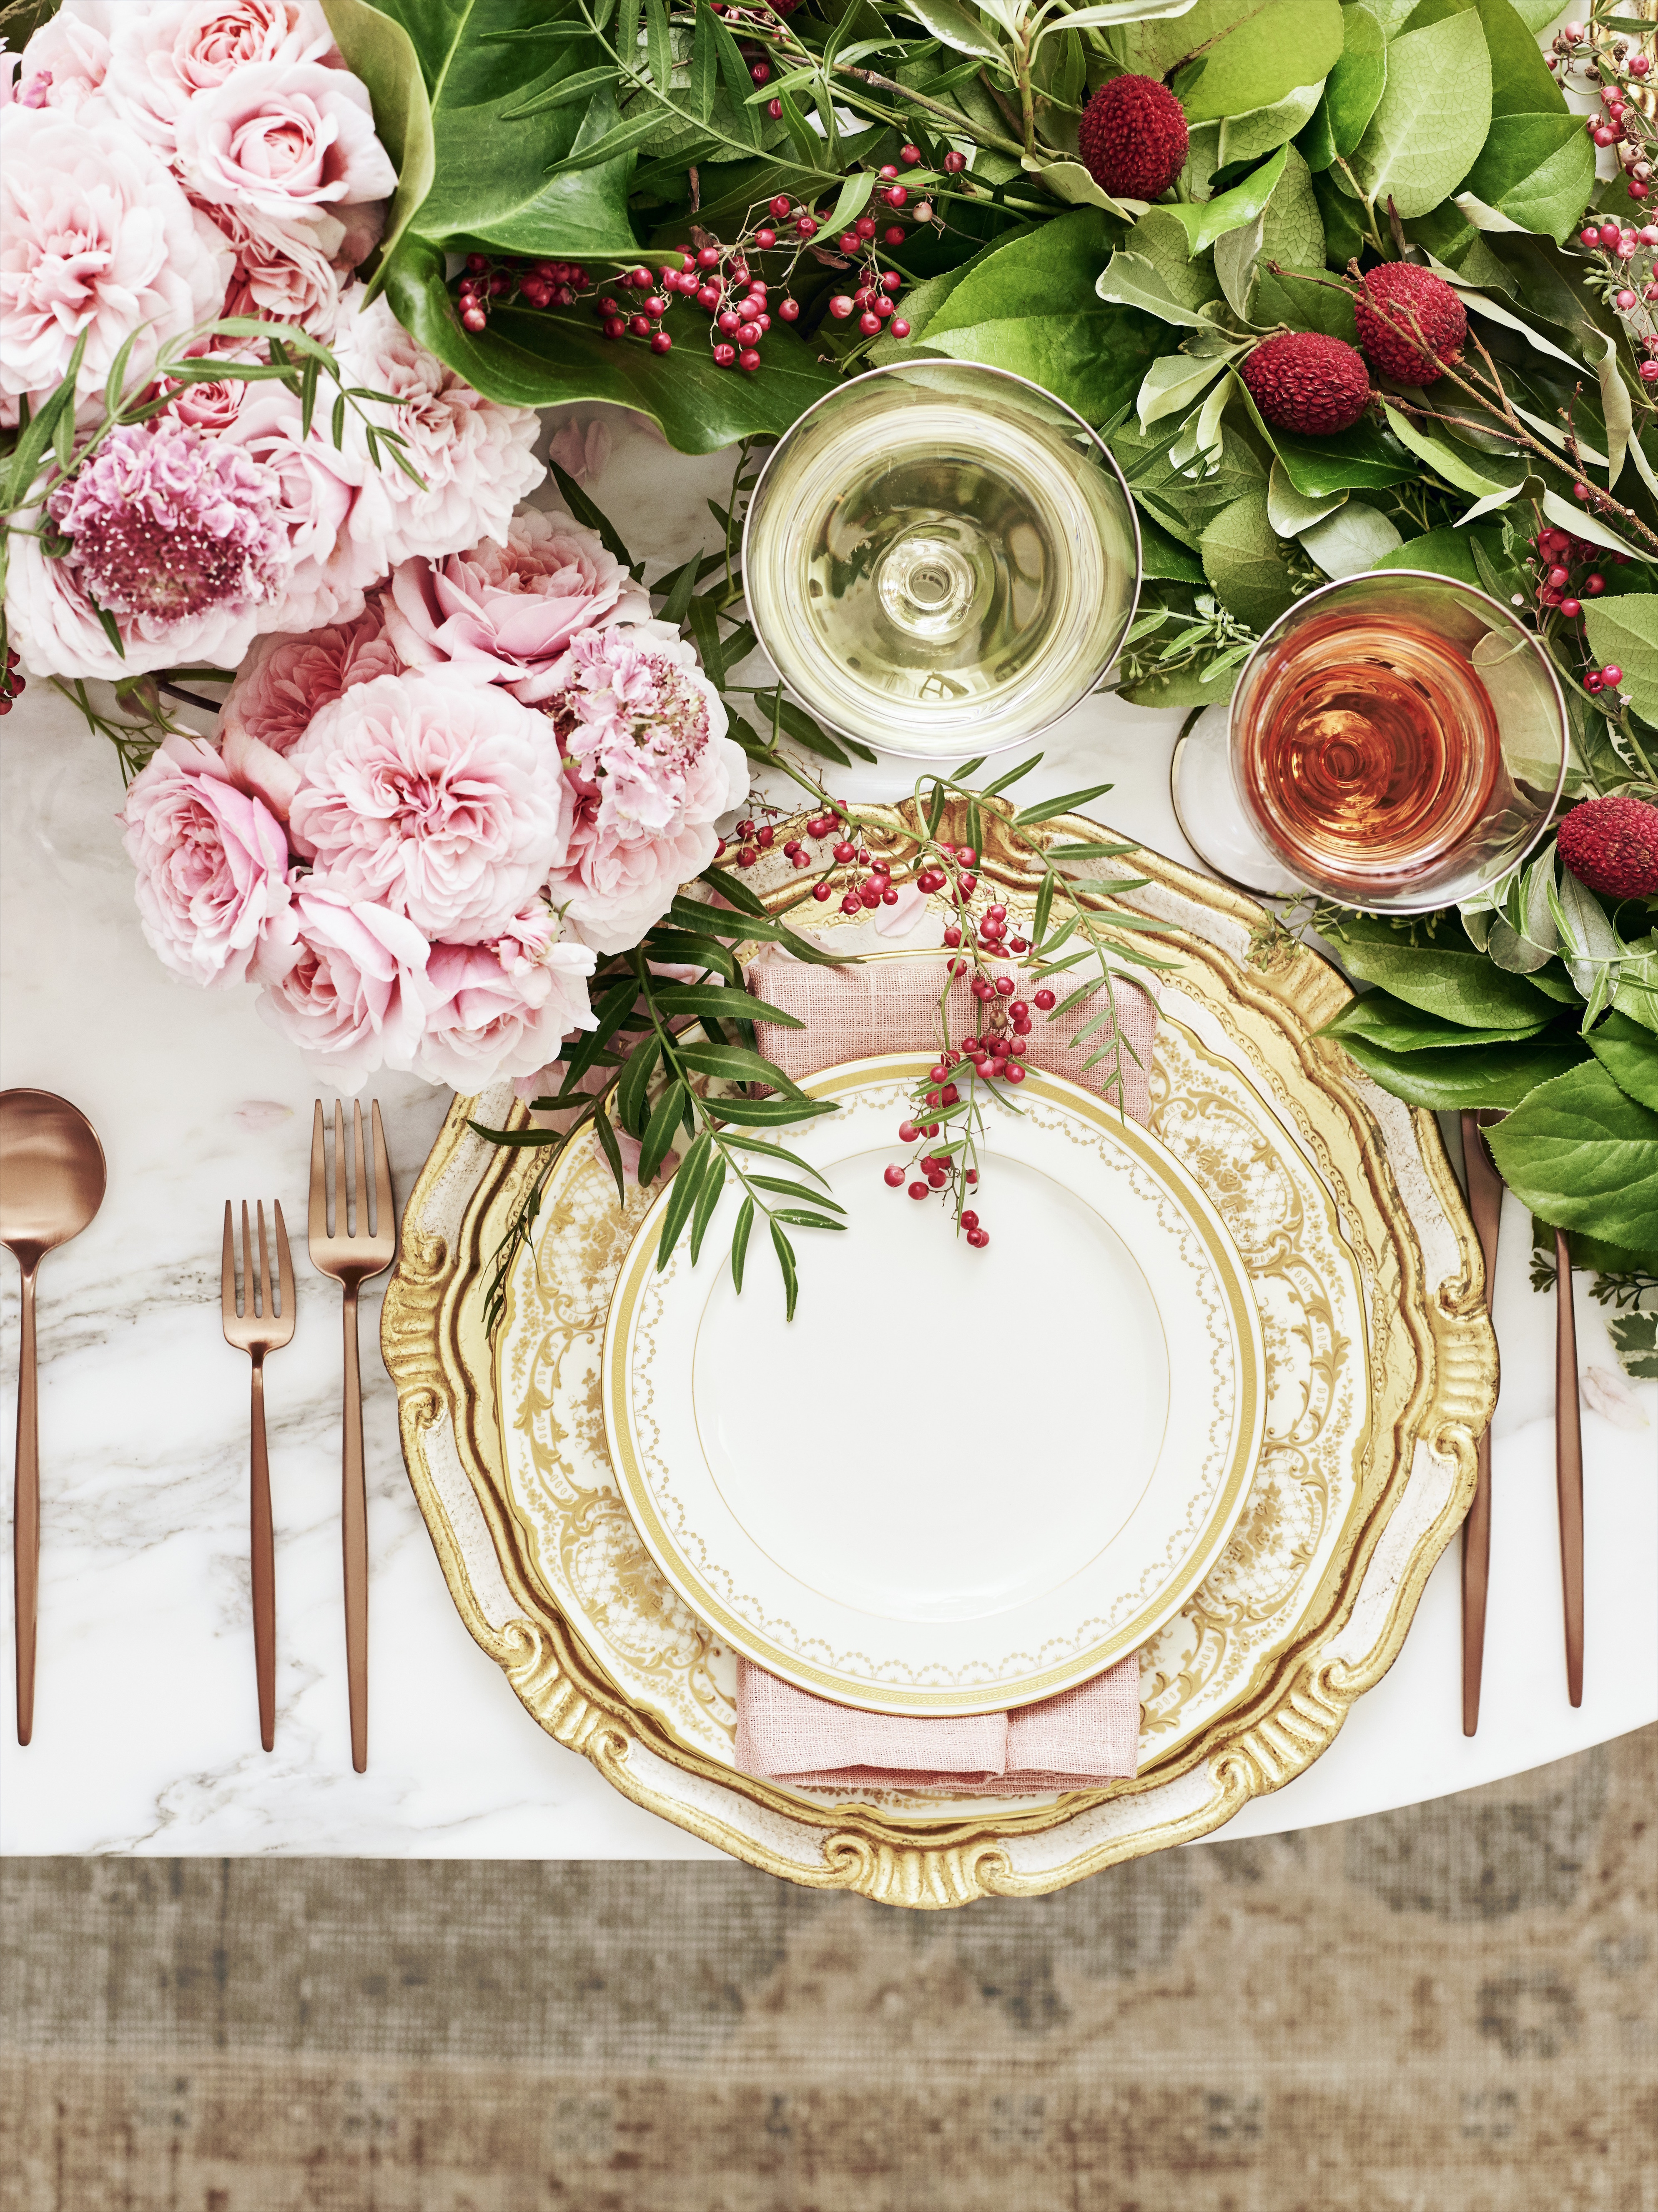 40 diy christmas table decorations and settings u0026 ideas for your christmas table